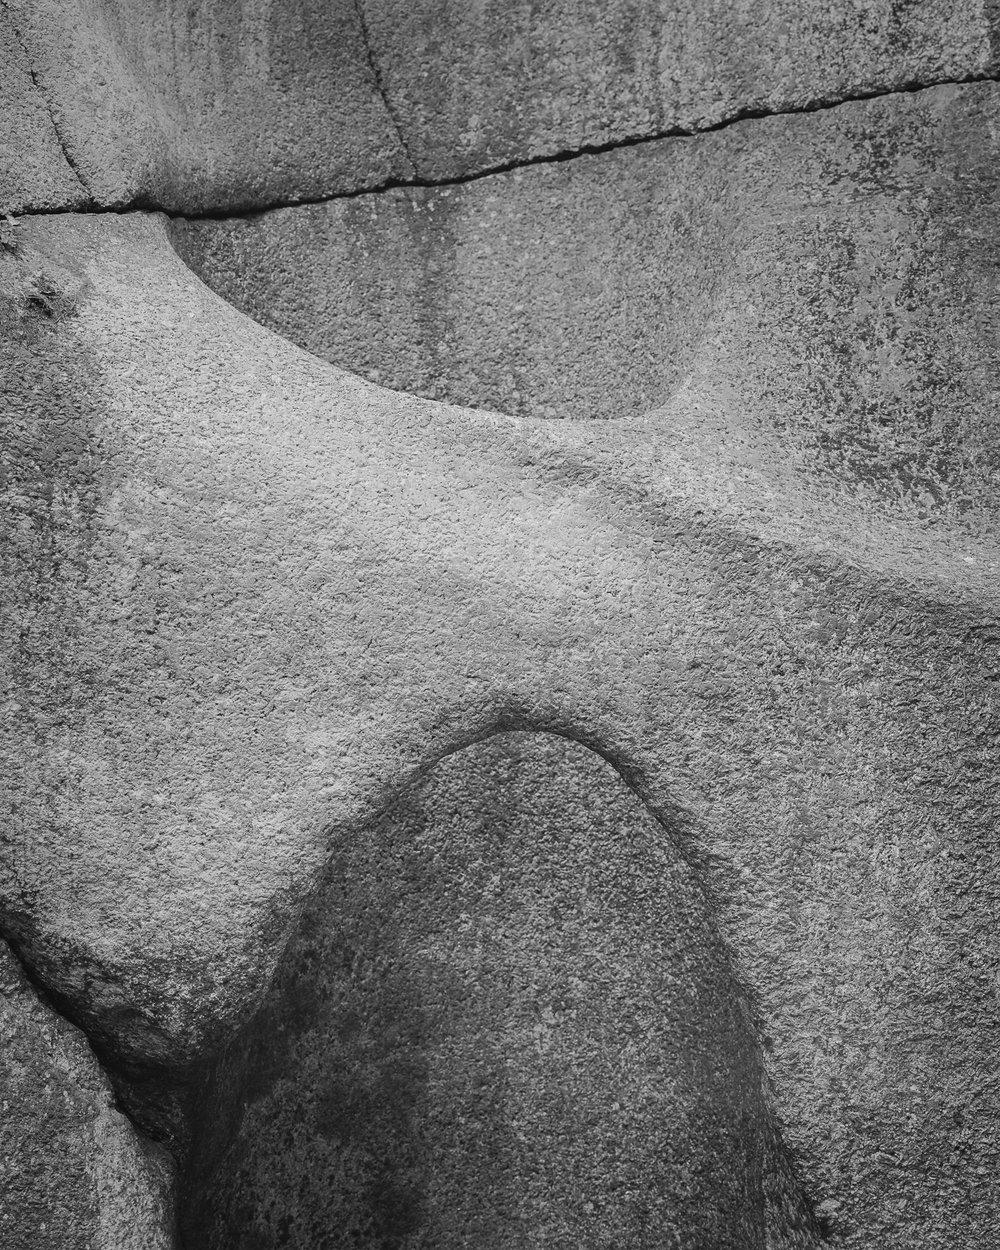 Pothole-CREOScan9Bjorn.Joachimsen-©.jpg